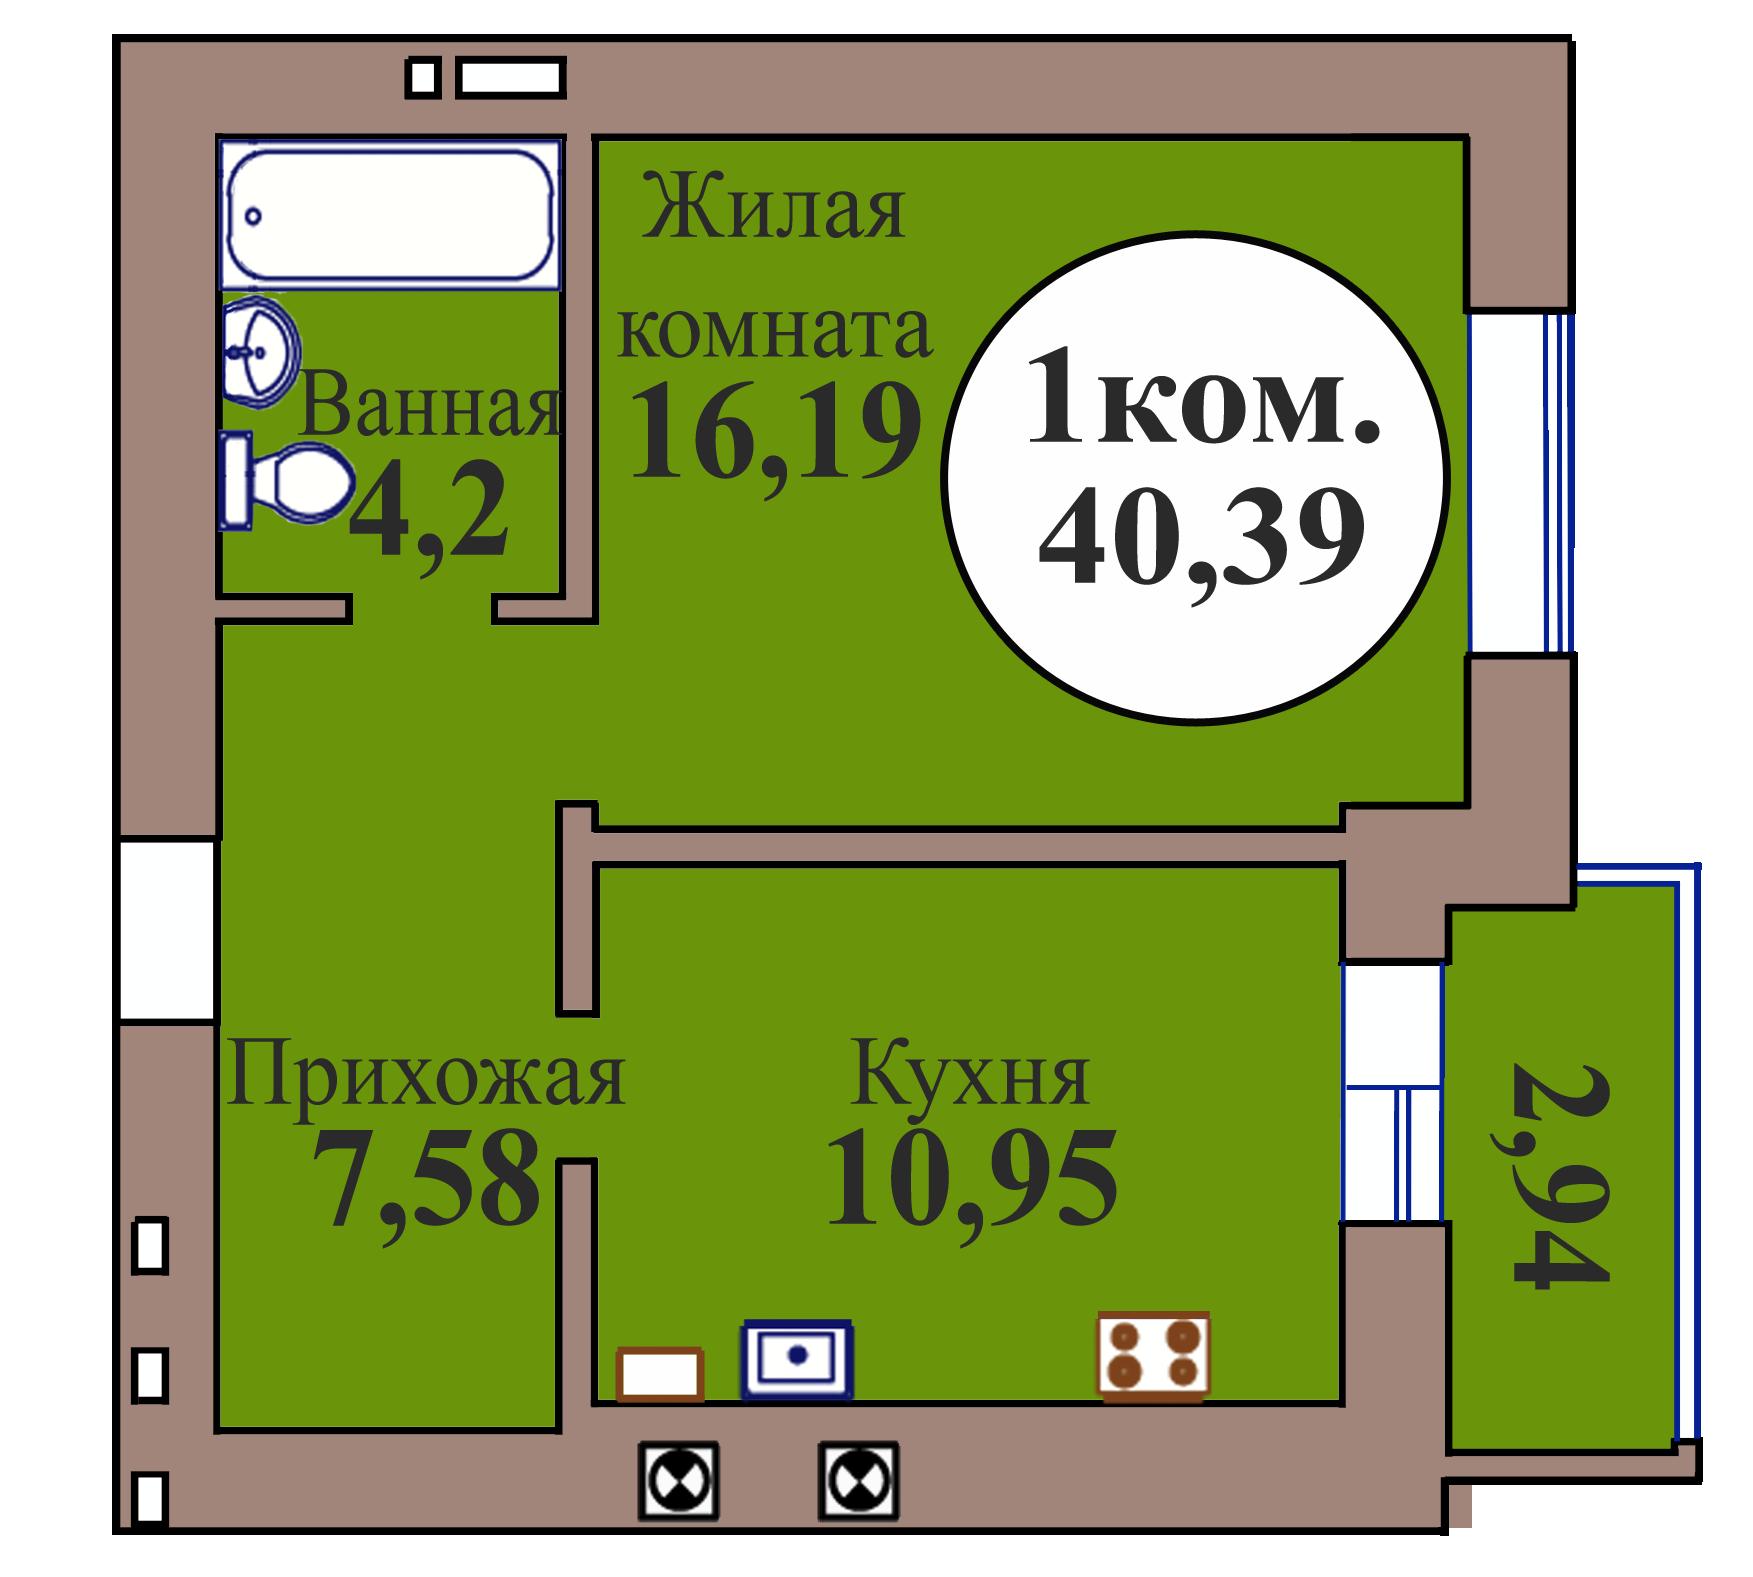 1-комн. кв. по пер. Калининградский, 5 кв. 117 в Калининграде